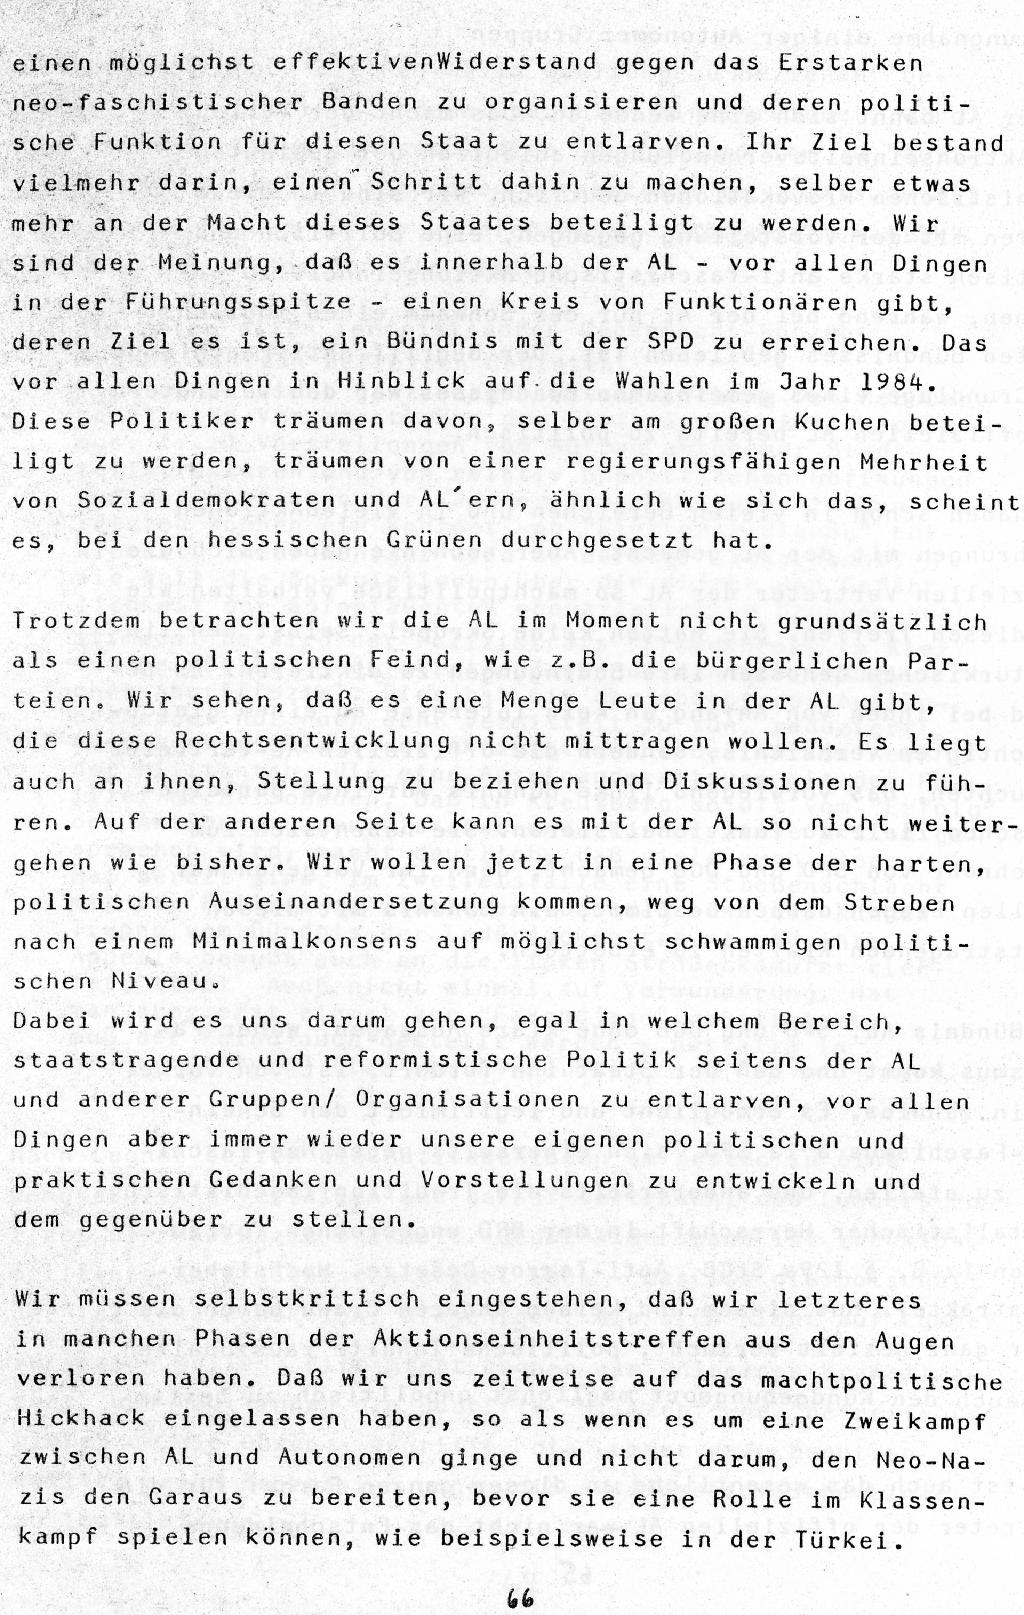 Berlin_1983_Autonome_Gruppen_Faschismus_im_Kapitalismus_66